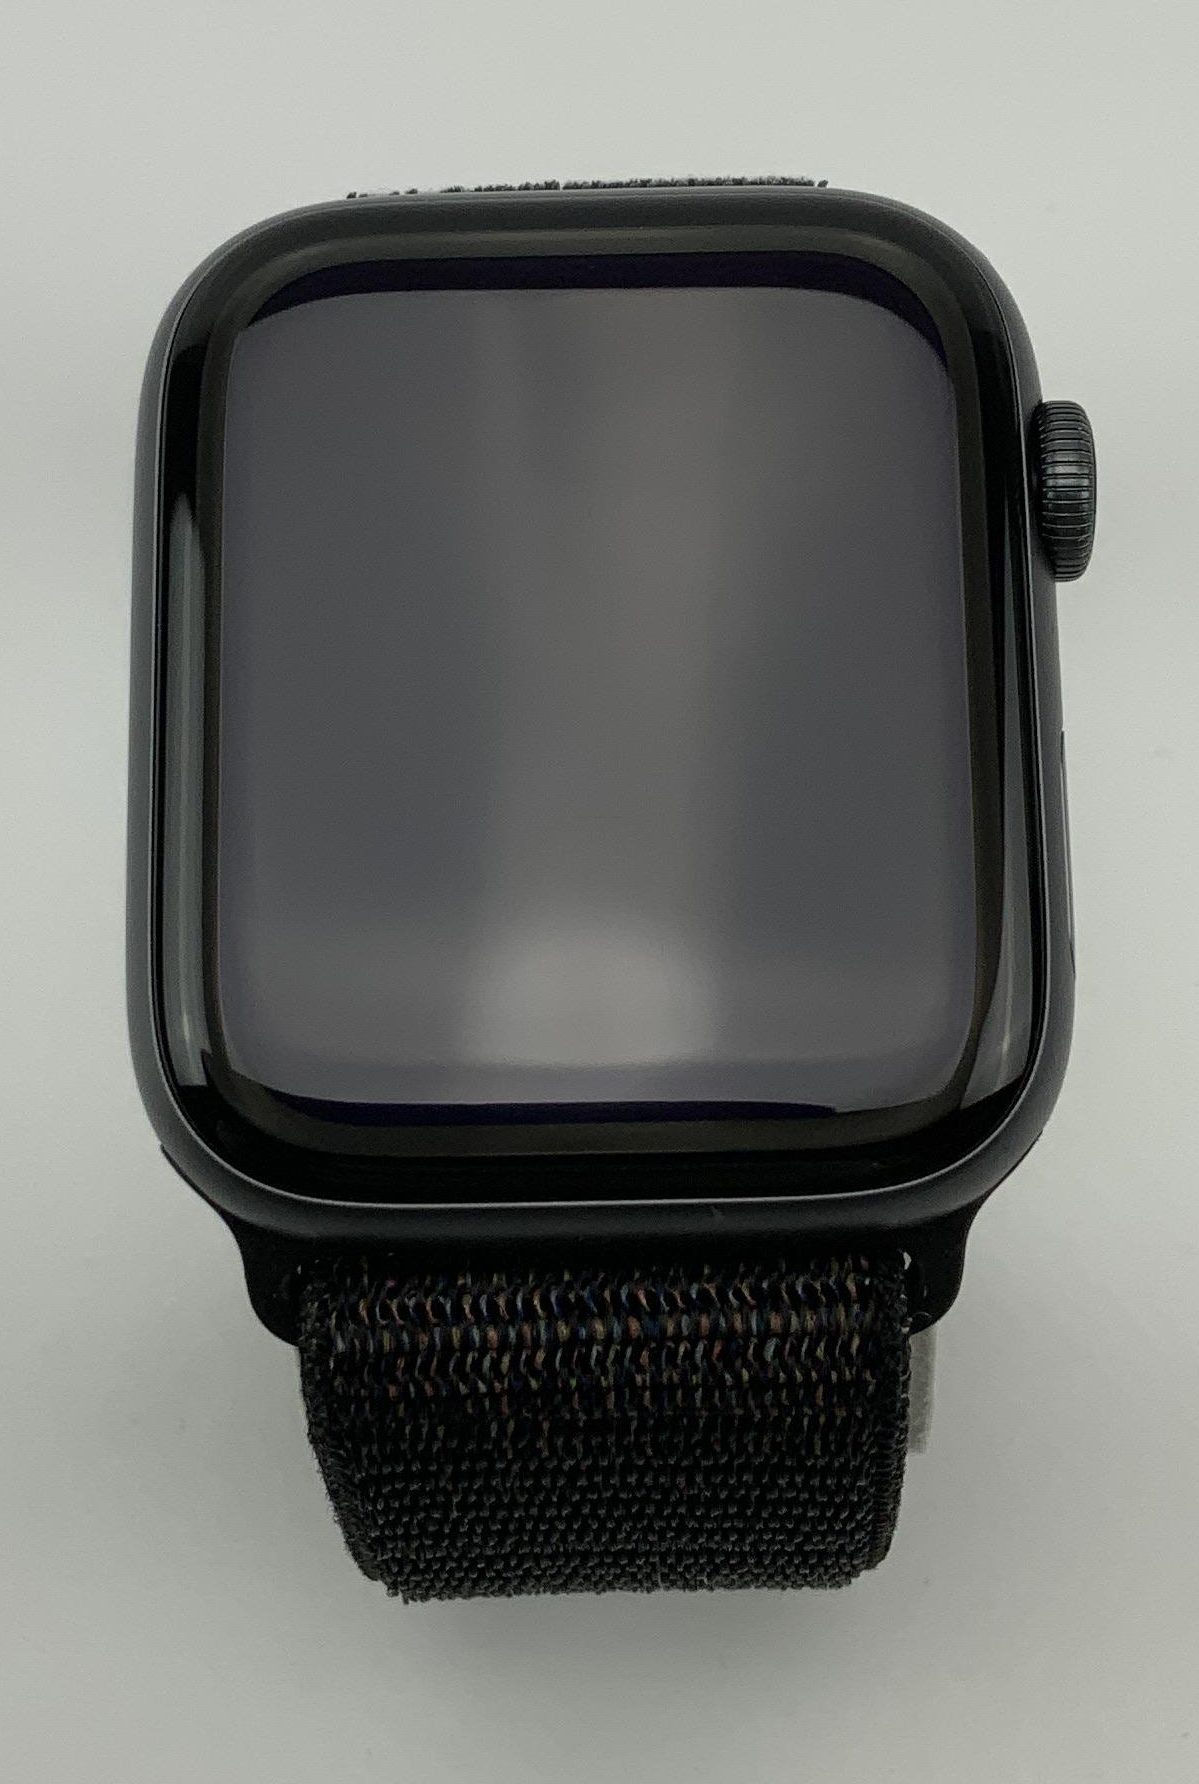 Watch Series 4 Aluminum (44mm), Space Gray, Black Sport Loop, Bild 1